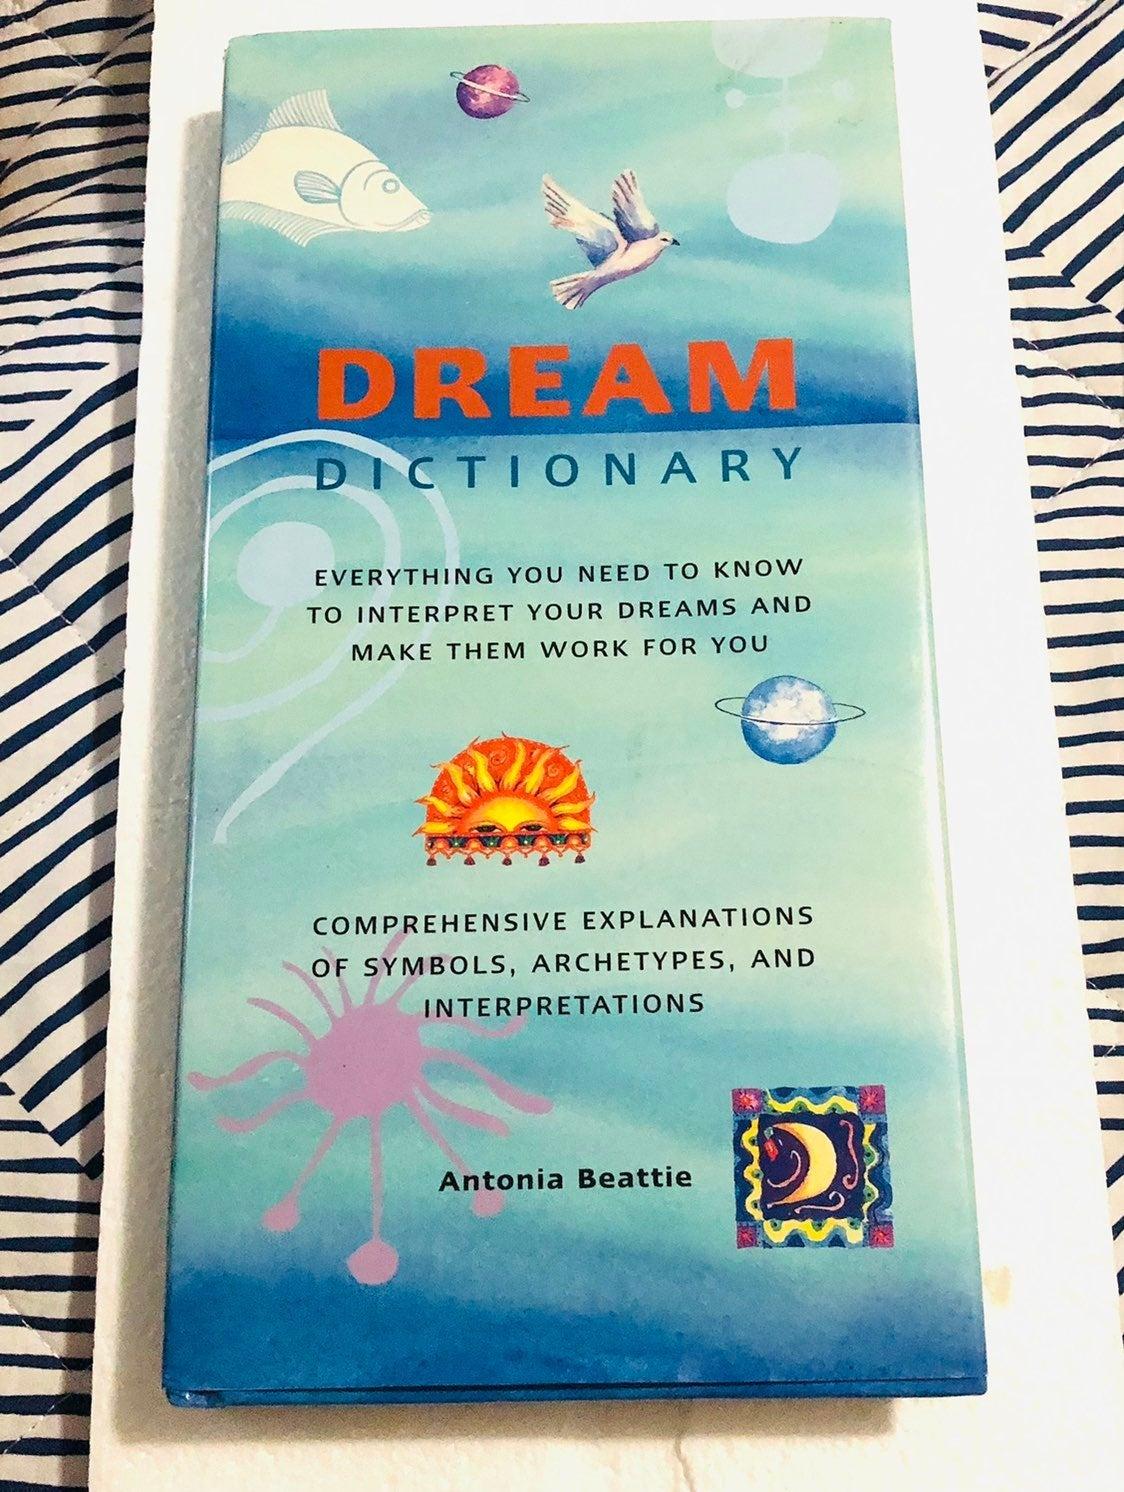 Dream Dictionary by Antonia Beattie